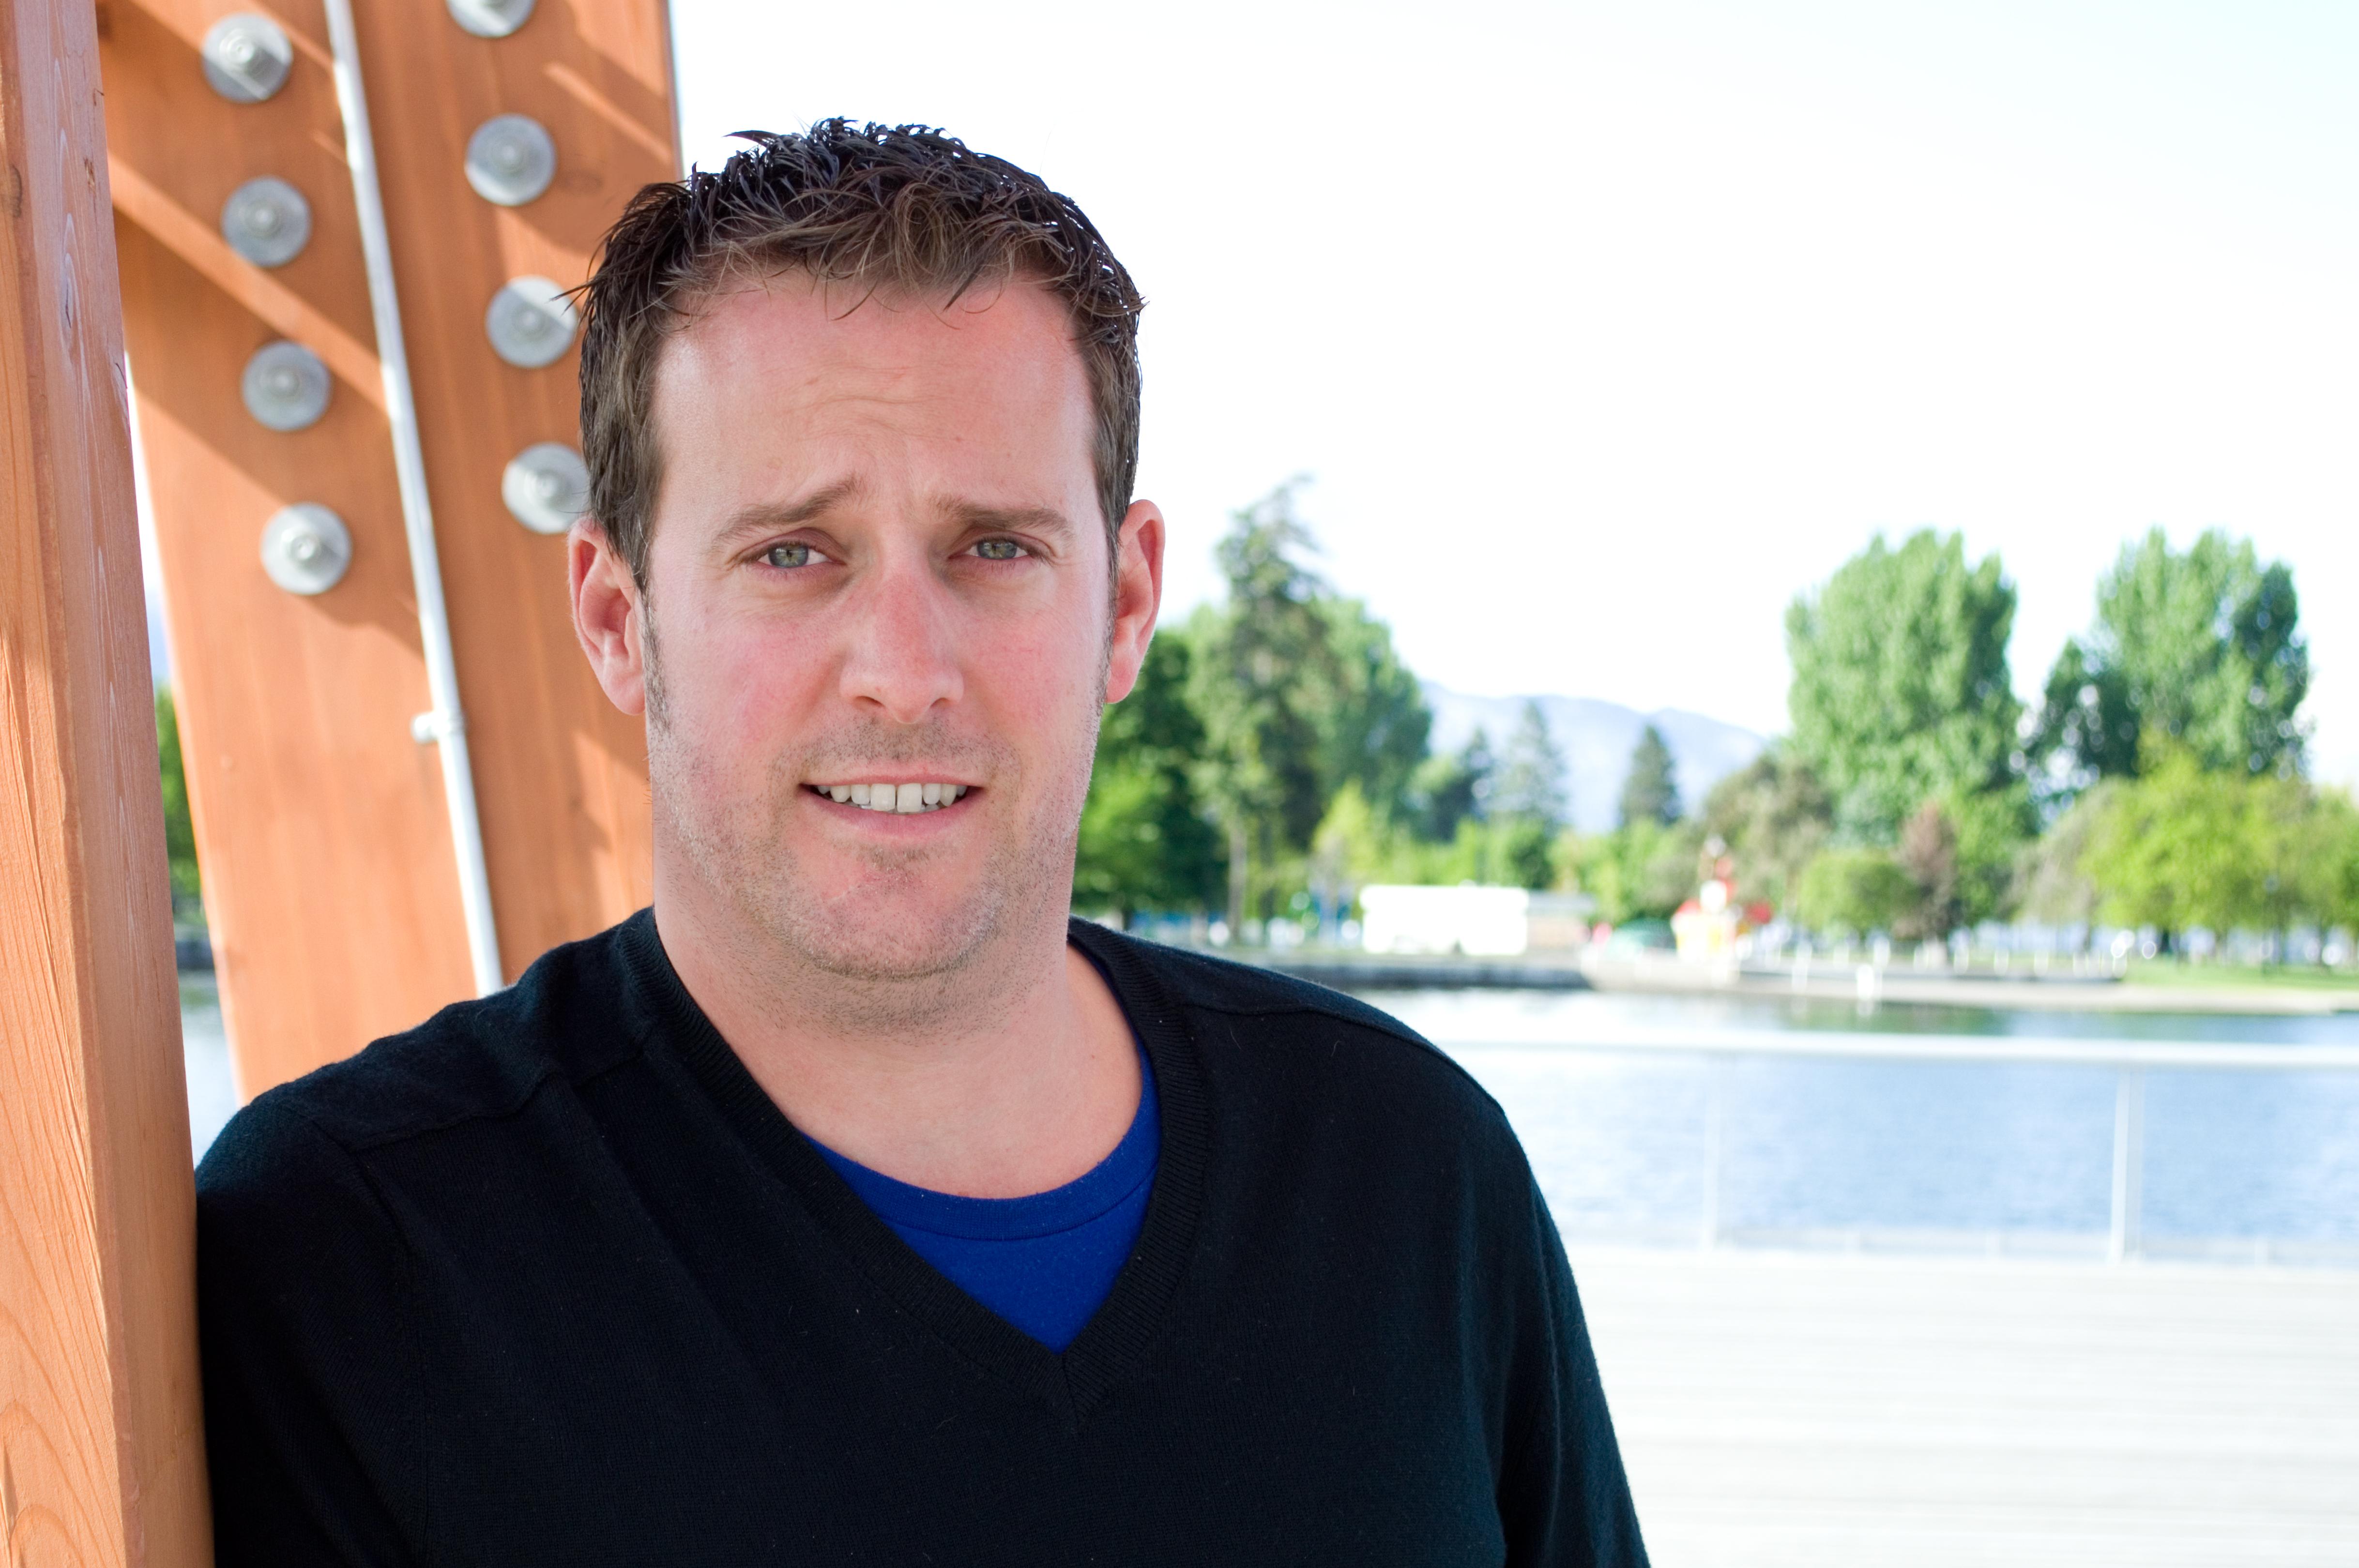 Darryl Reuter